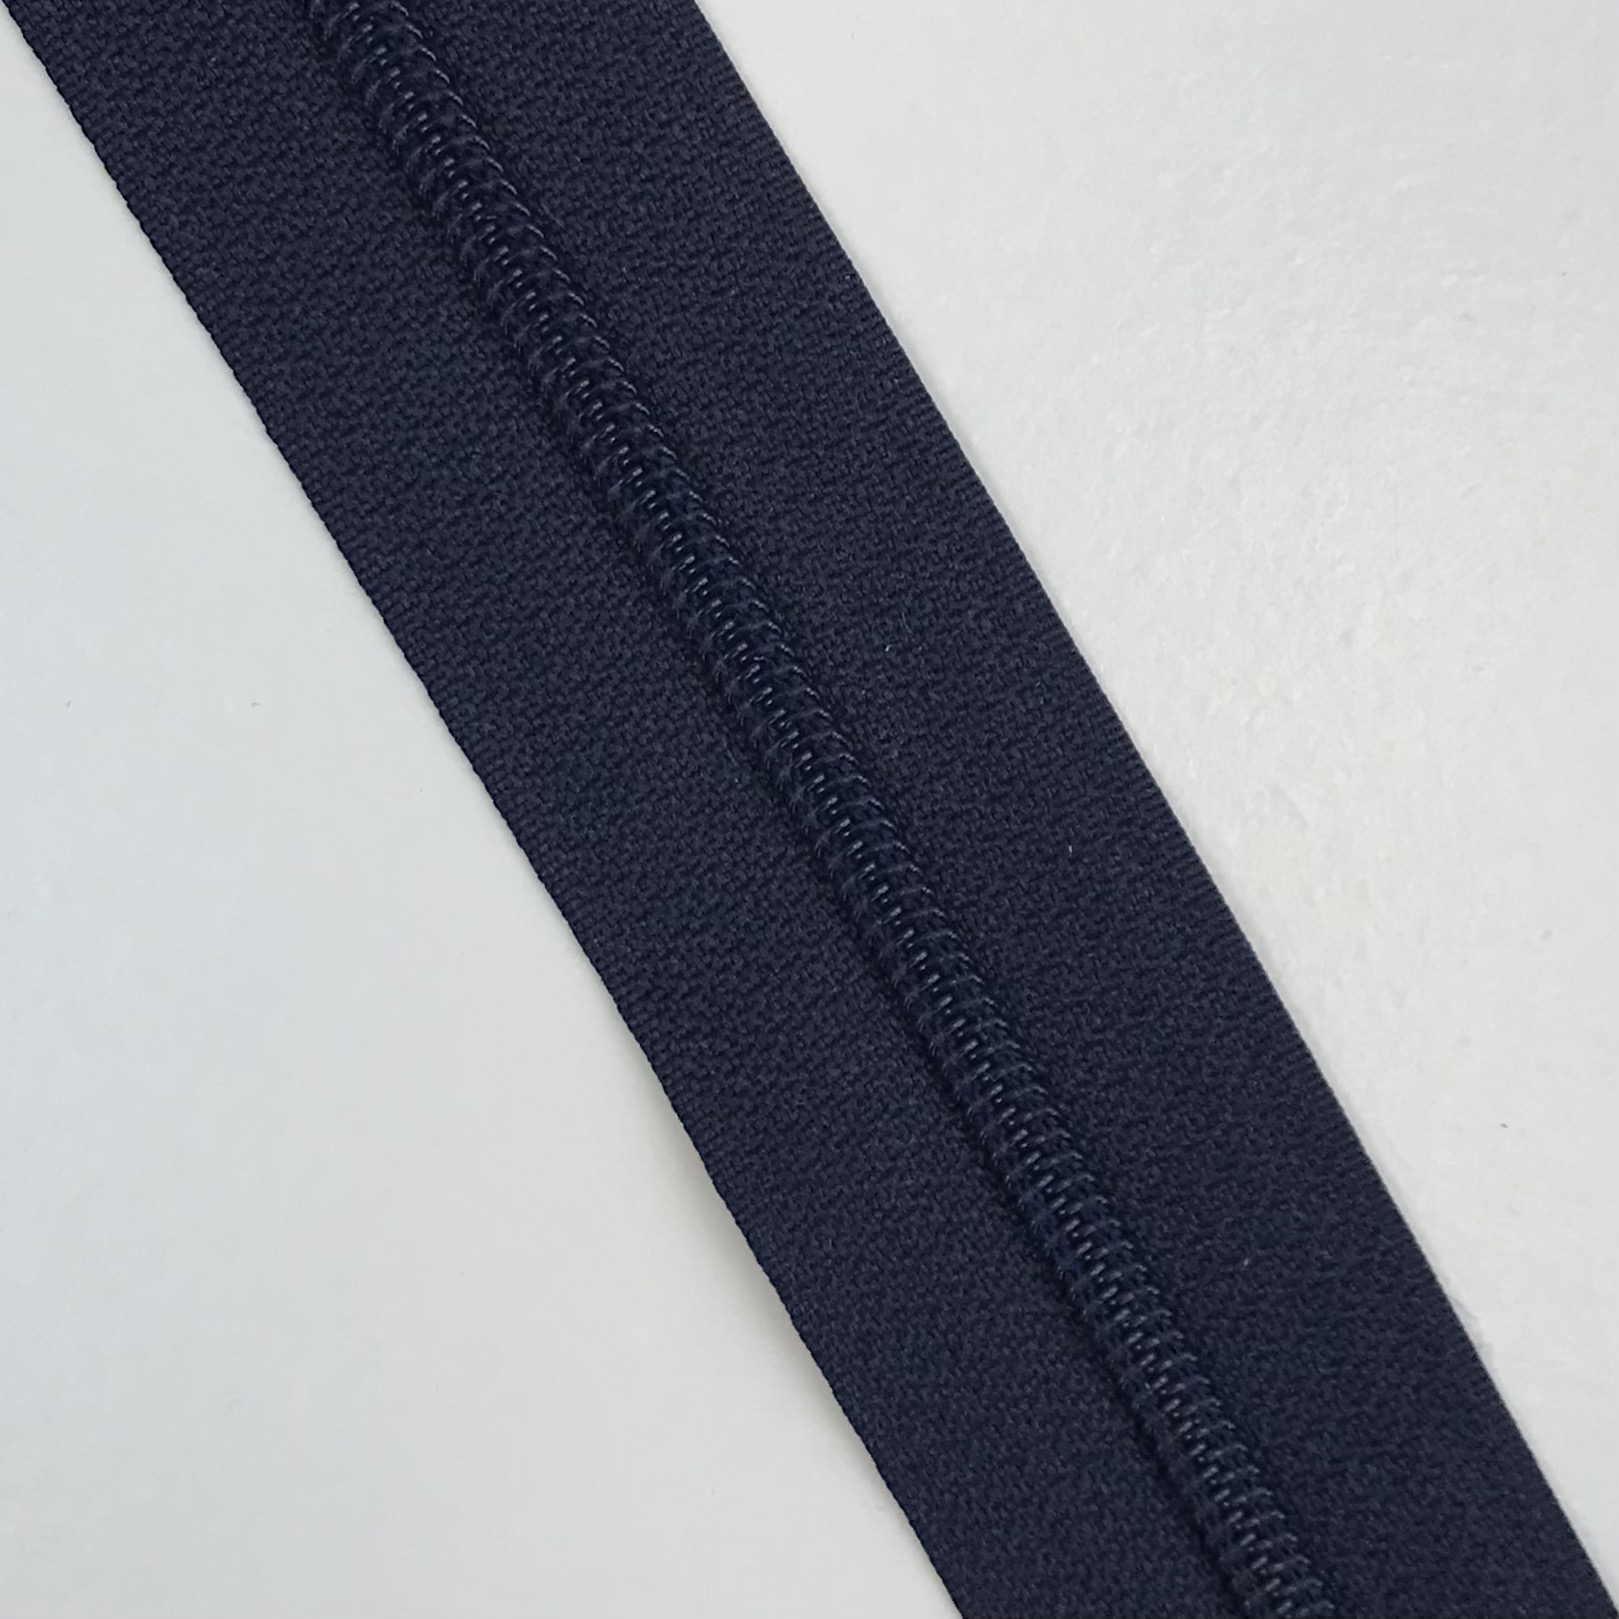 Endlosreißverschluss Meterware 3 mm, Union Knopf, dunkelblau, Farbe 68. Art. 4511